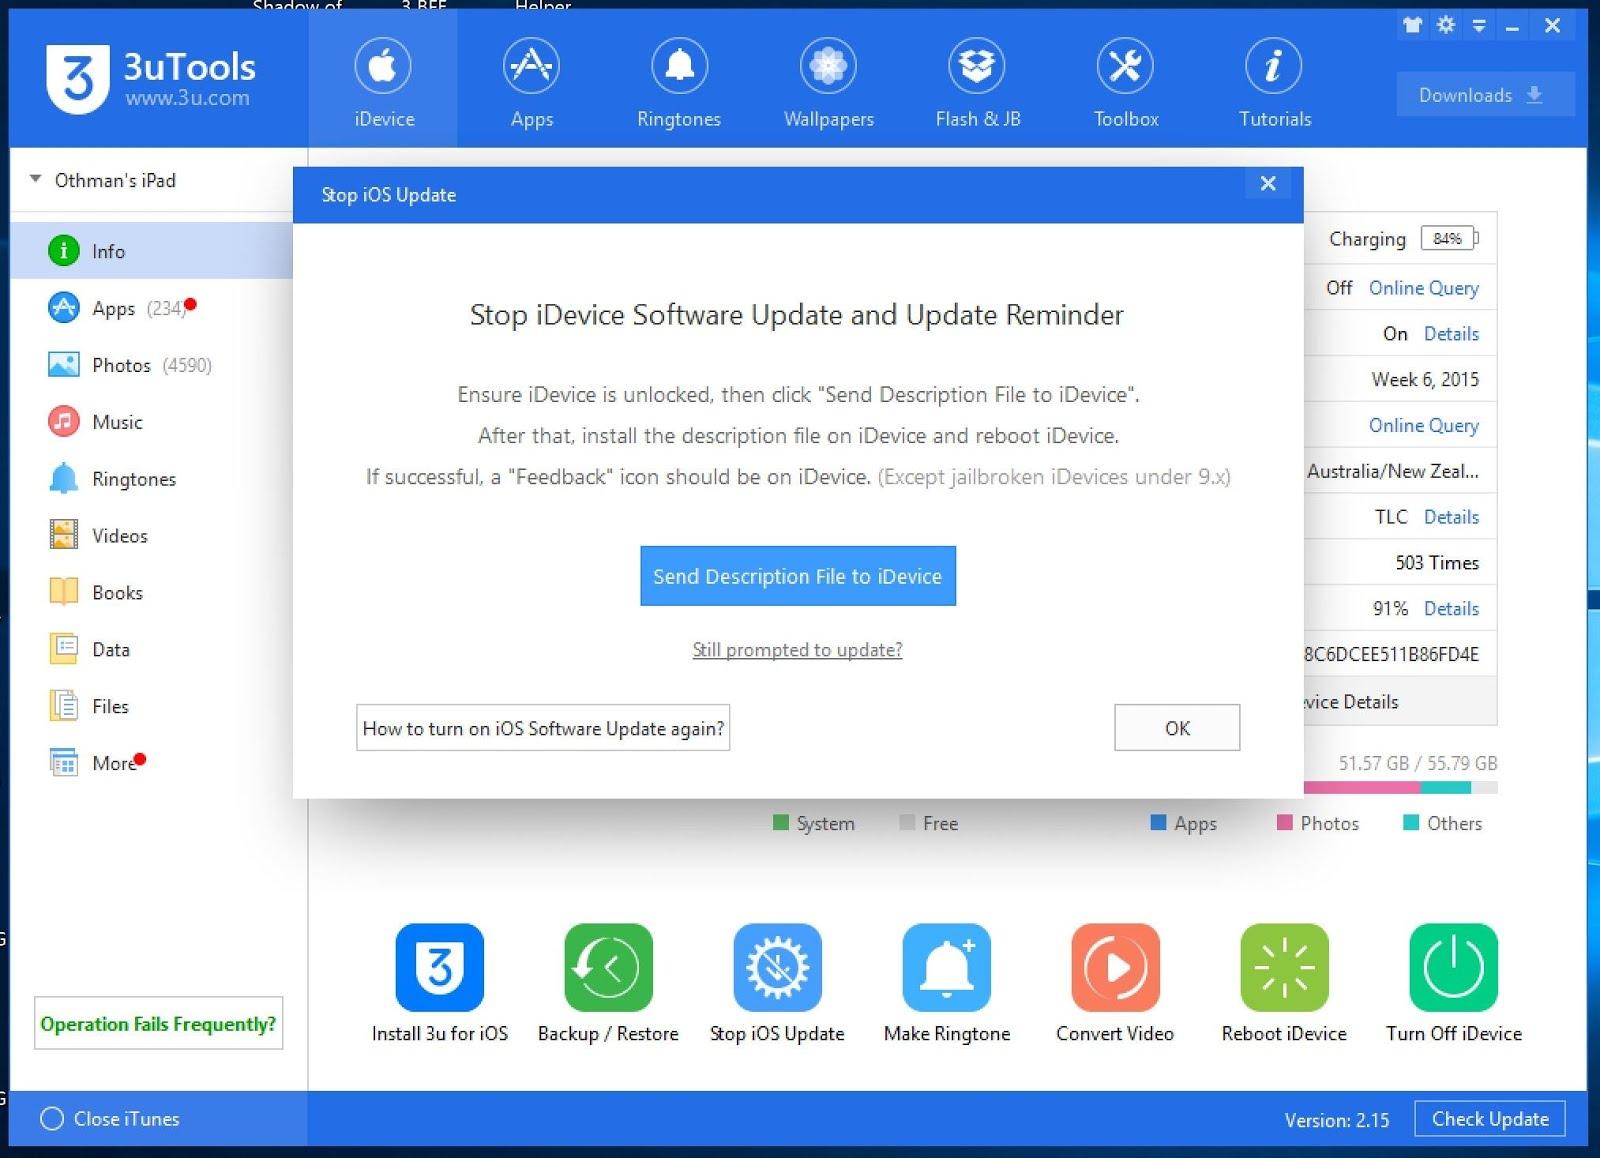 مراجعة برنامج 3u Tools افضل بديل لـiTools و Tongbu لادارة الآيفون